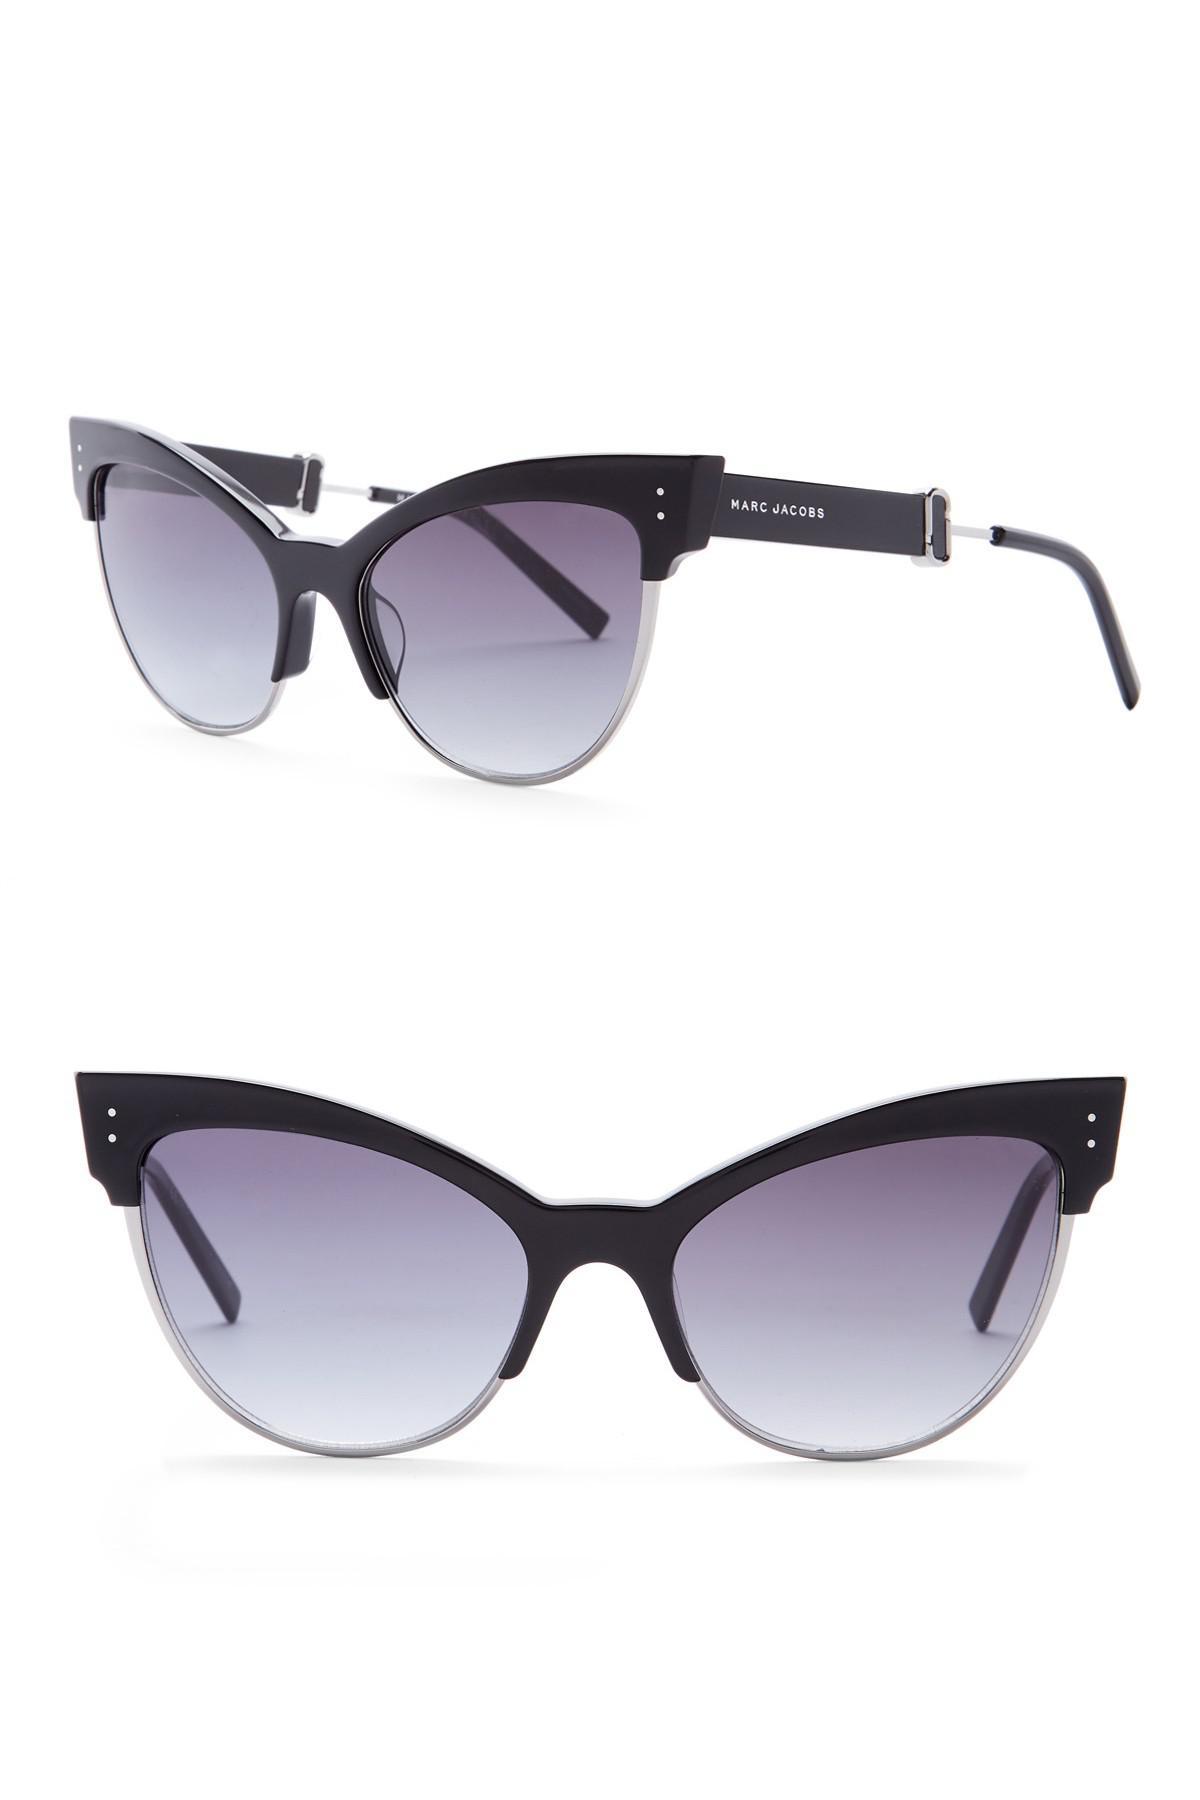 7c35793ef37 Lyst - Marc Jacobs Women s 55mm Cat Eye Sunglasses